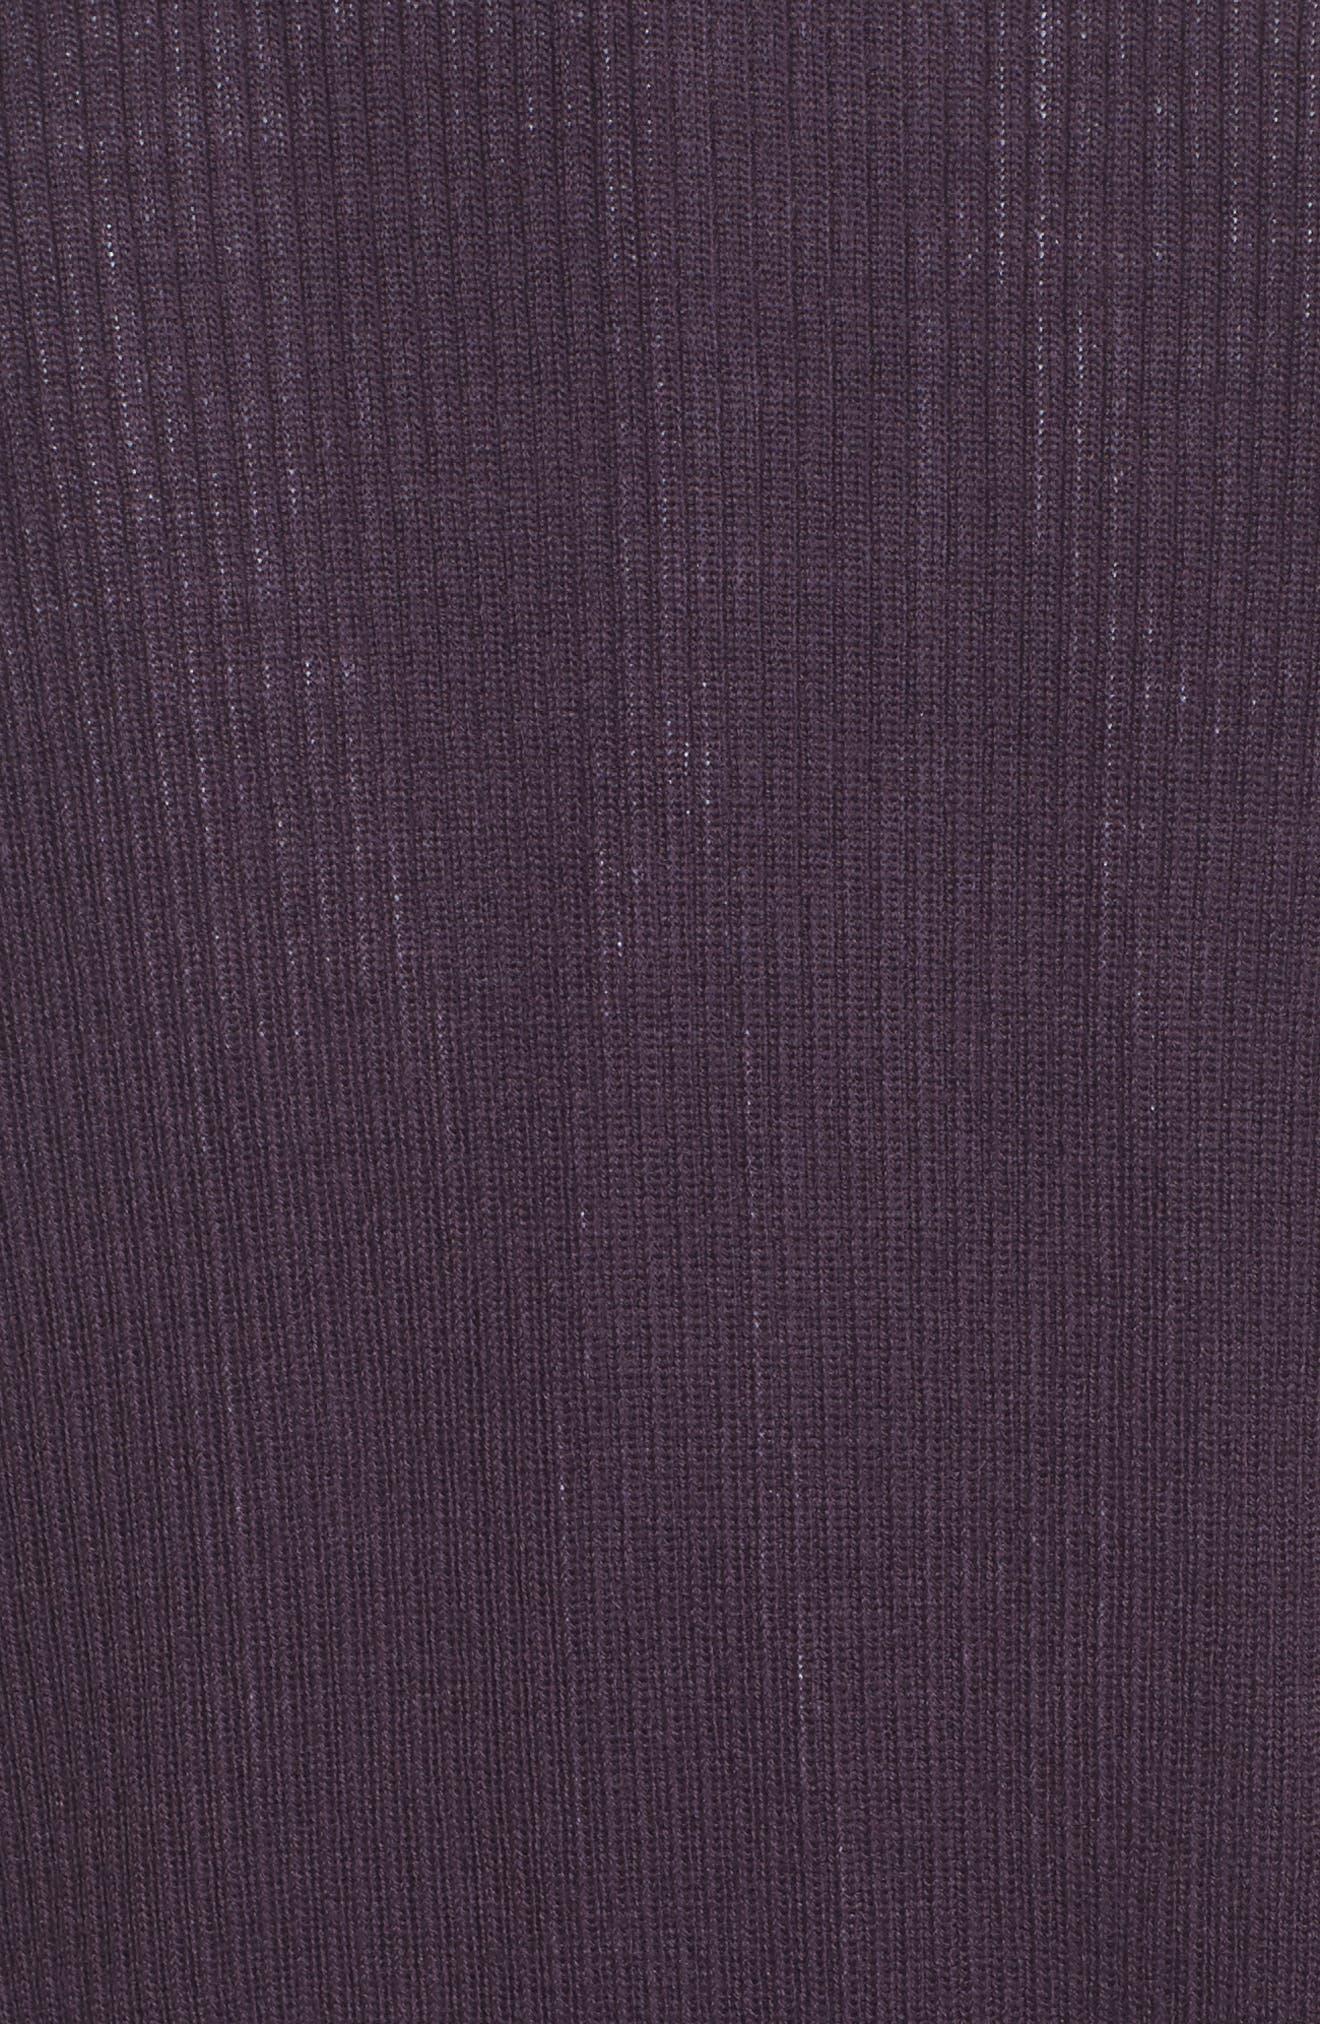 Rib Knit Wool Blend Cardigan,                             Alternate thumbnail 94, color,